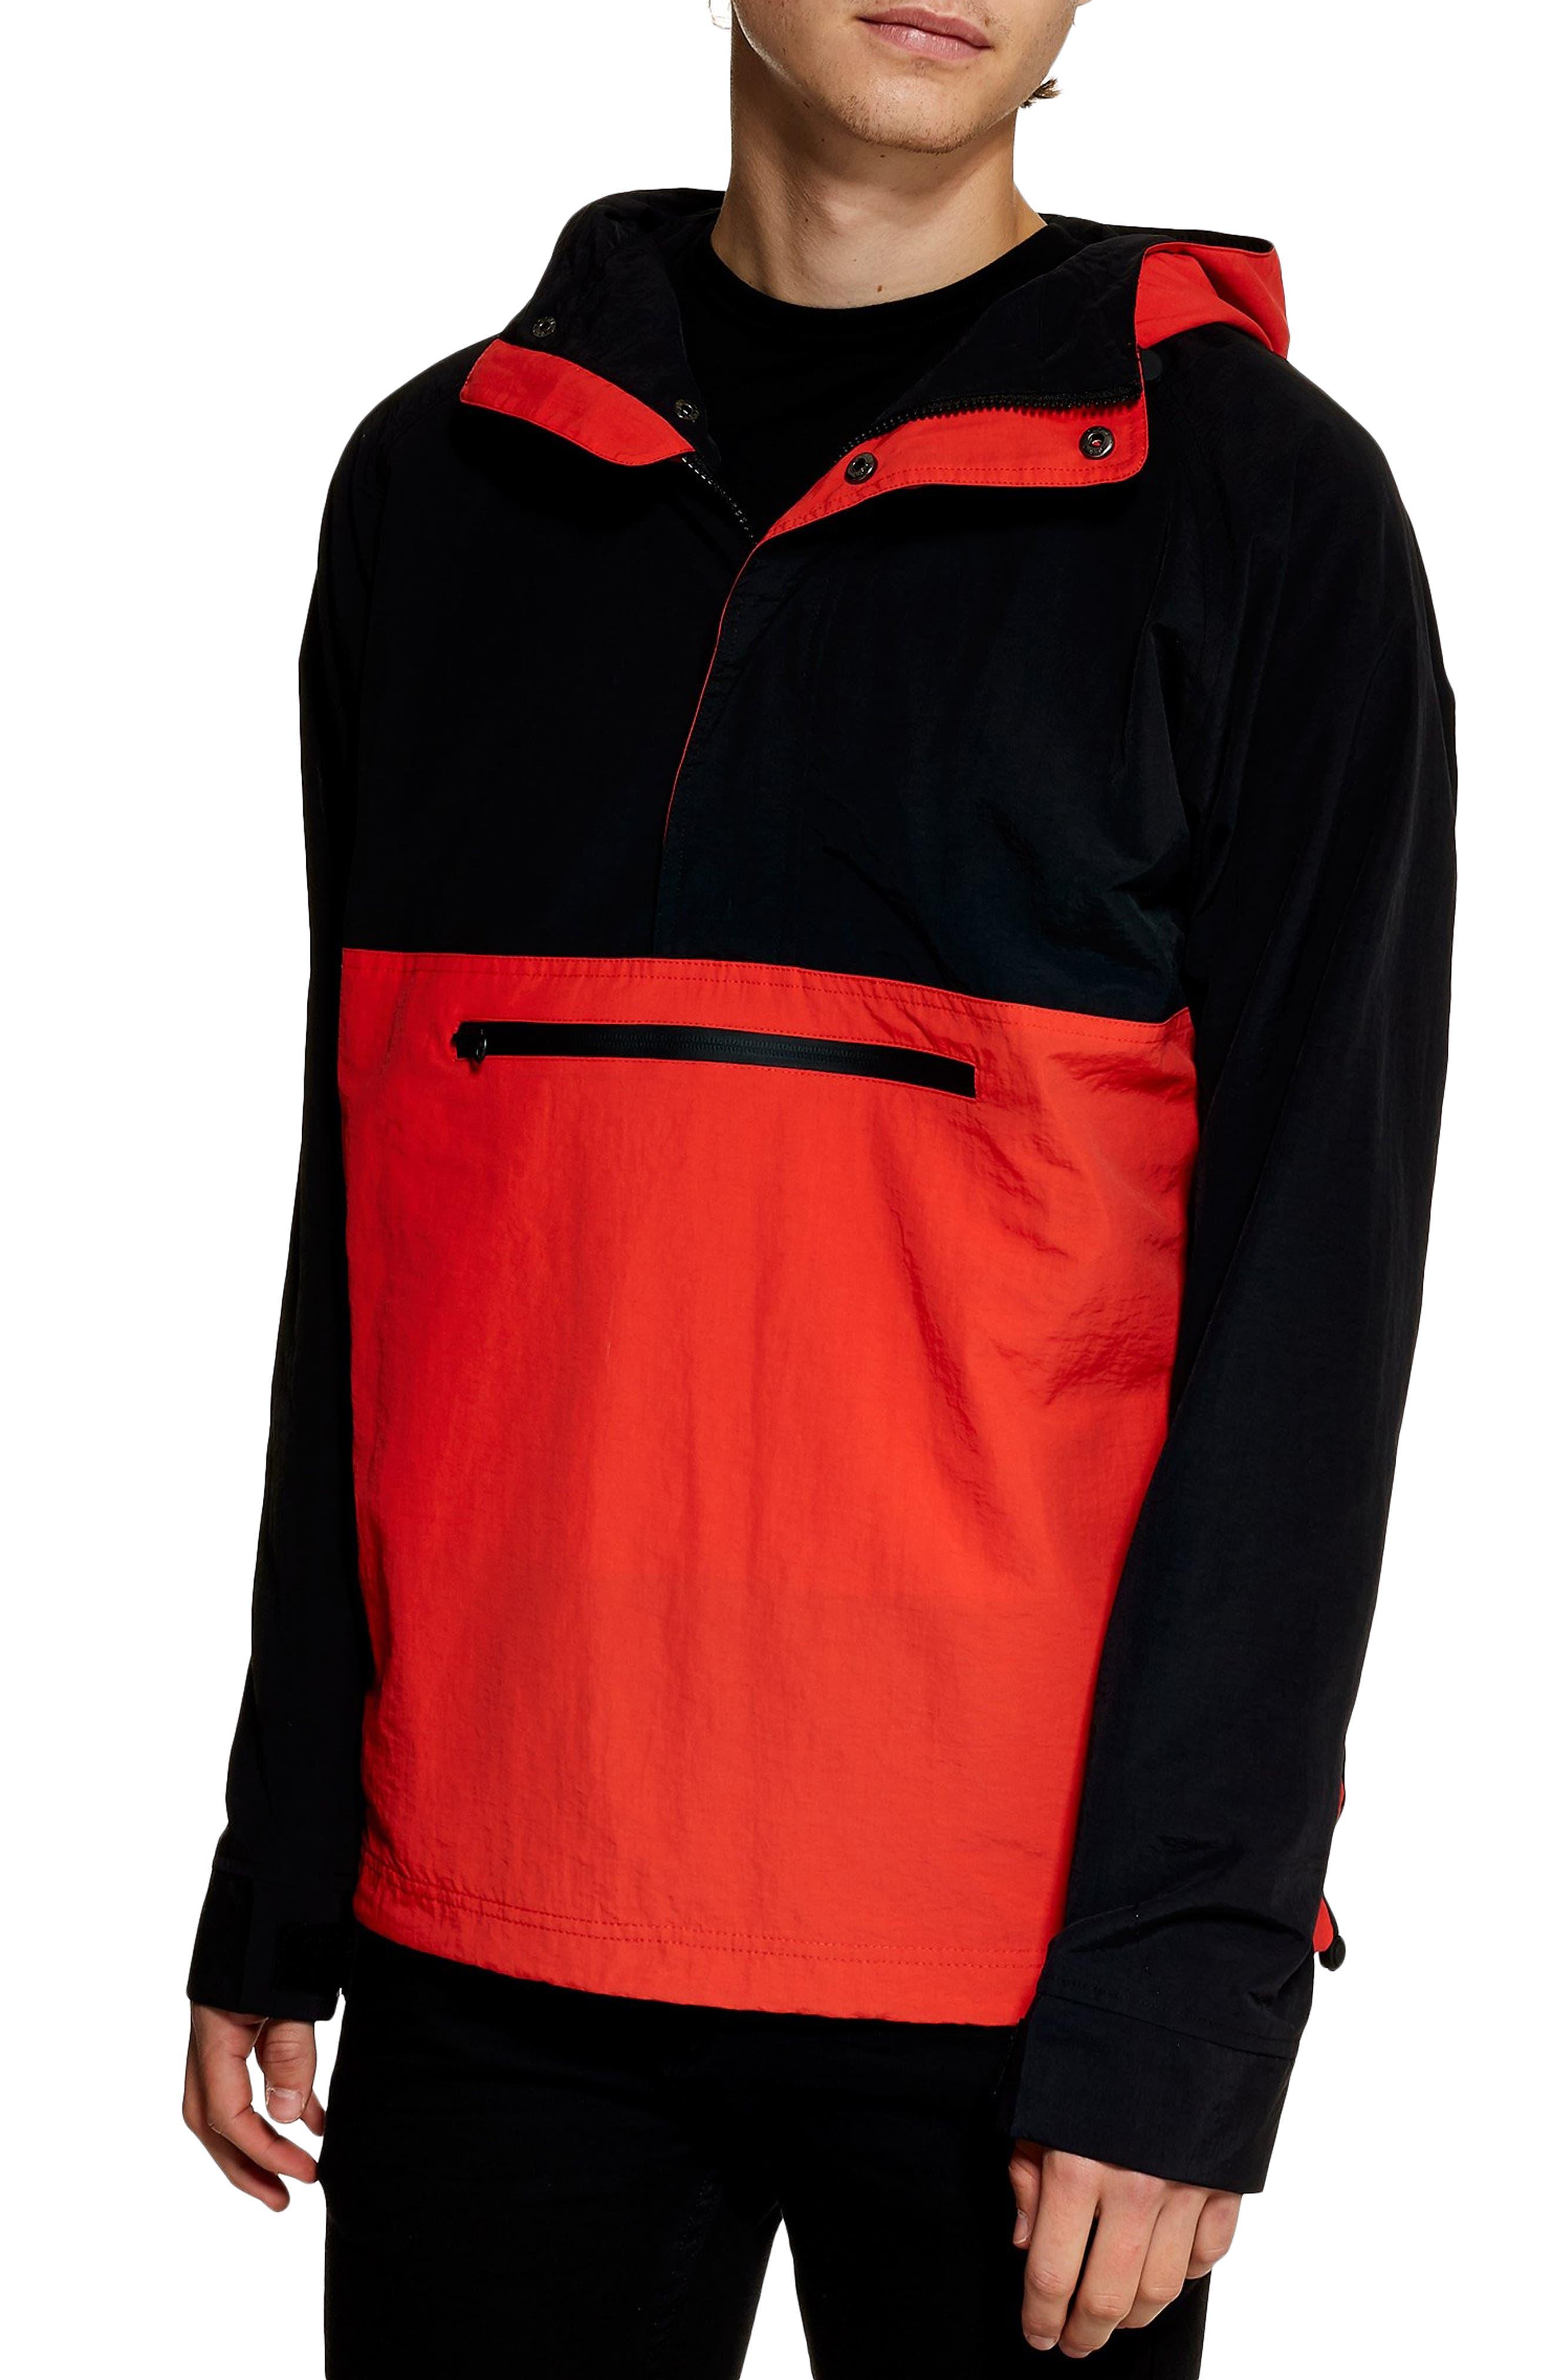 TOPMAN, Hooded Quarter Zip Windbreaker, Main thumbnail 1, color, RED MULTI